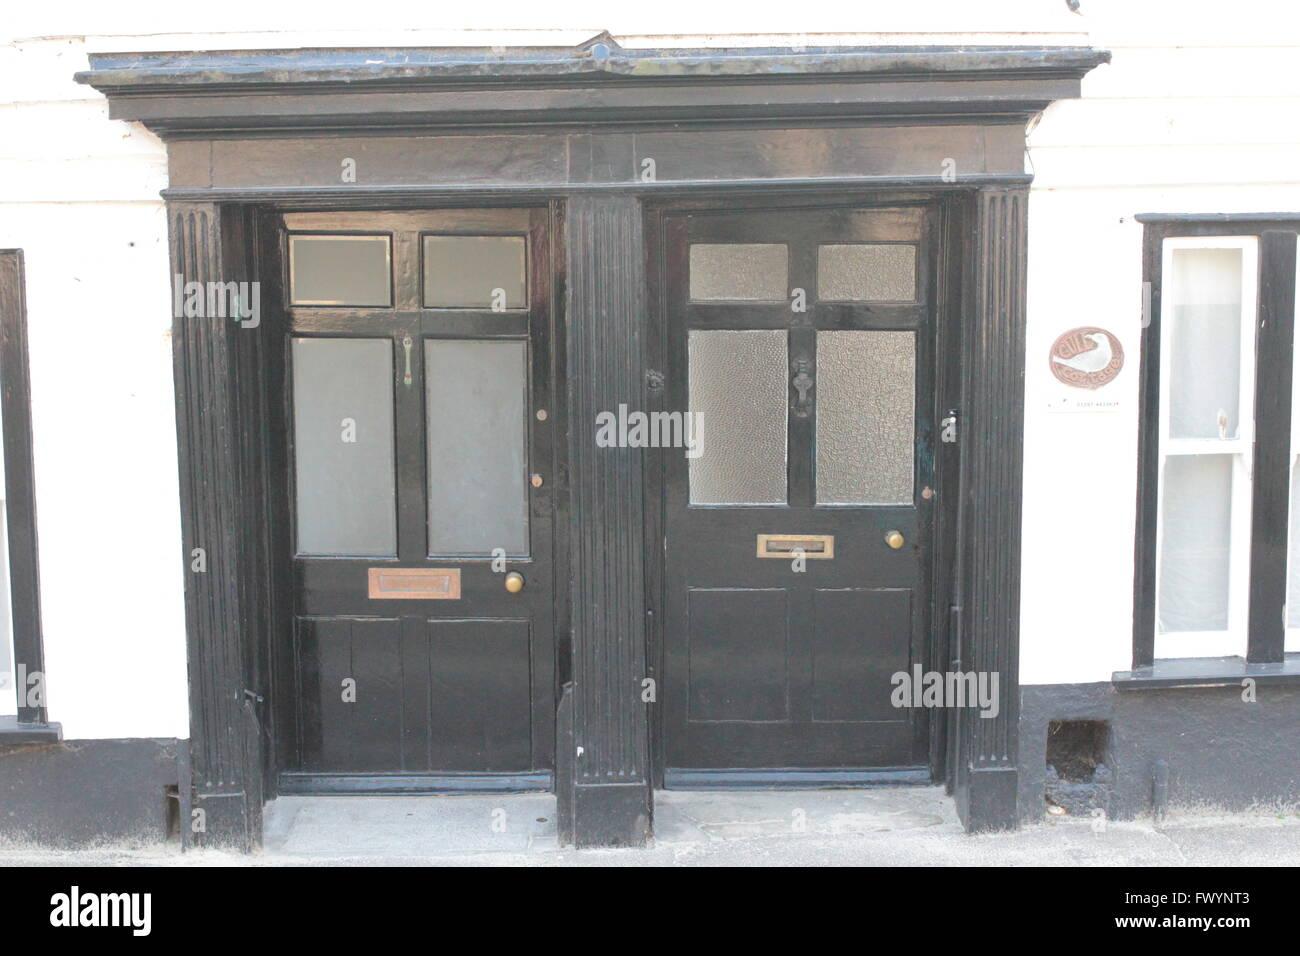 Schwarze Türen zwei schwarze türen stockfoto, bild: 102028083 - alamy